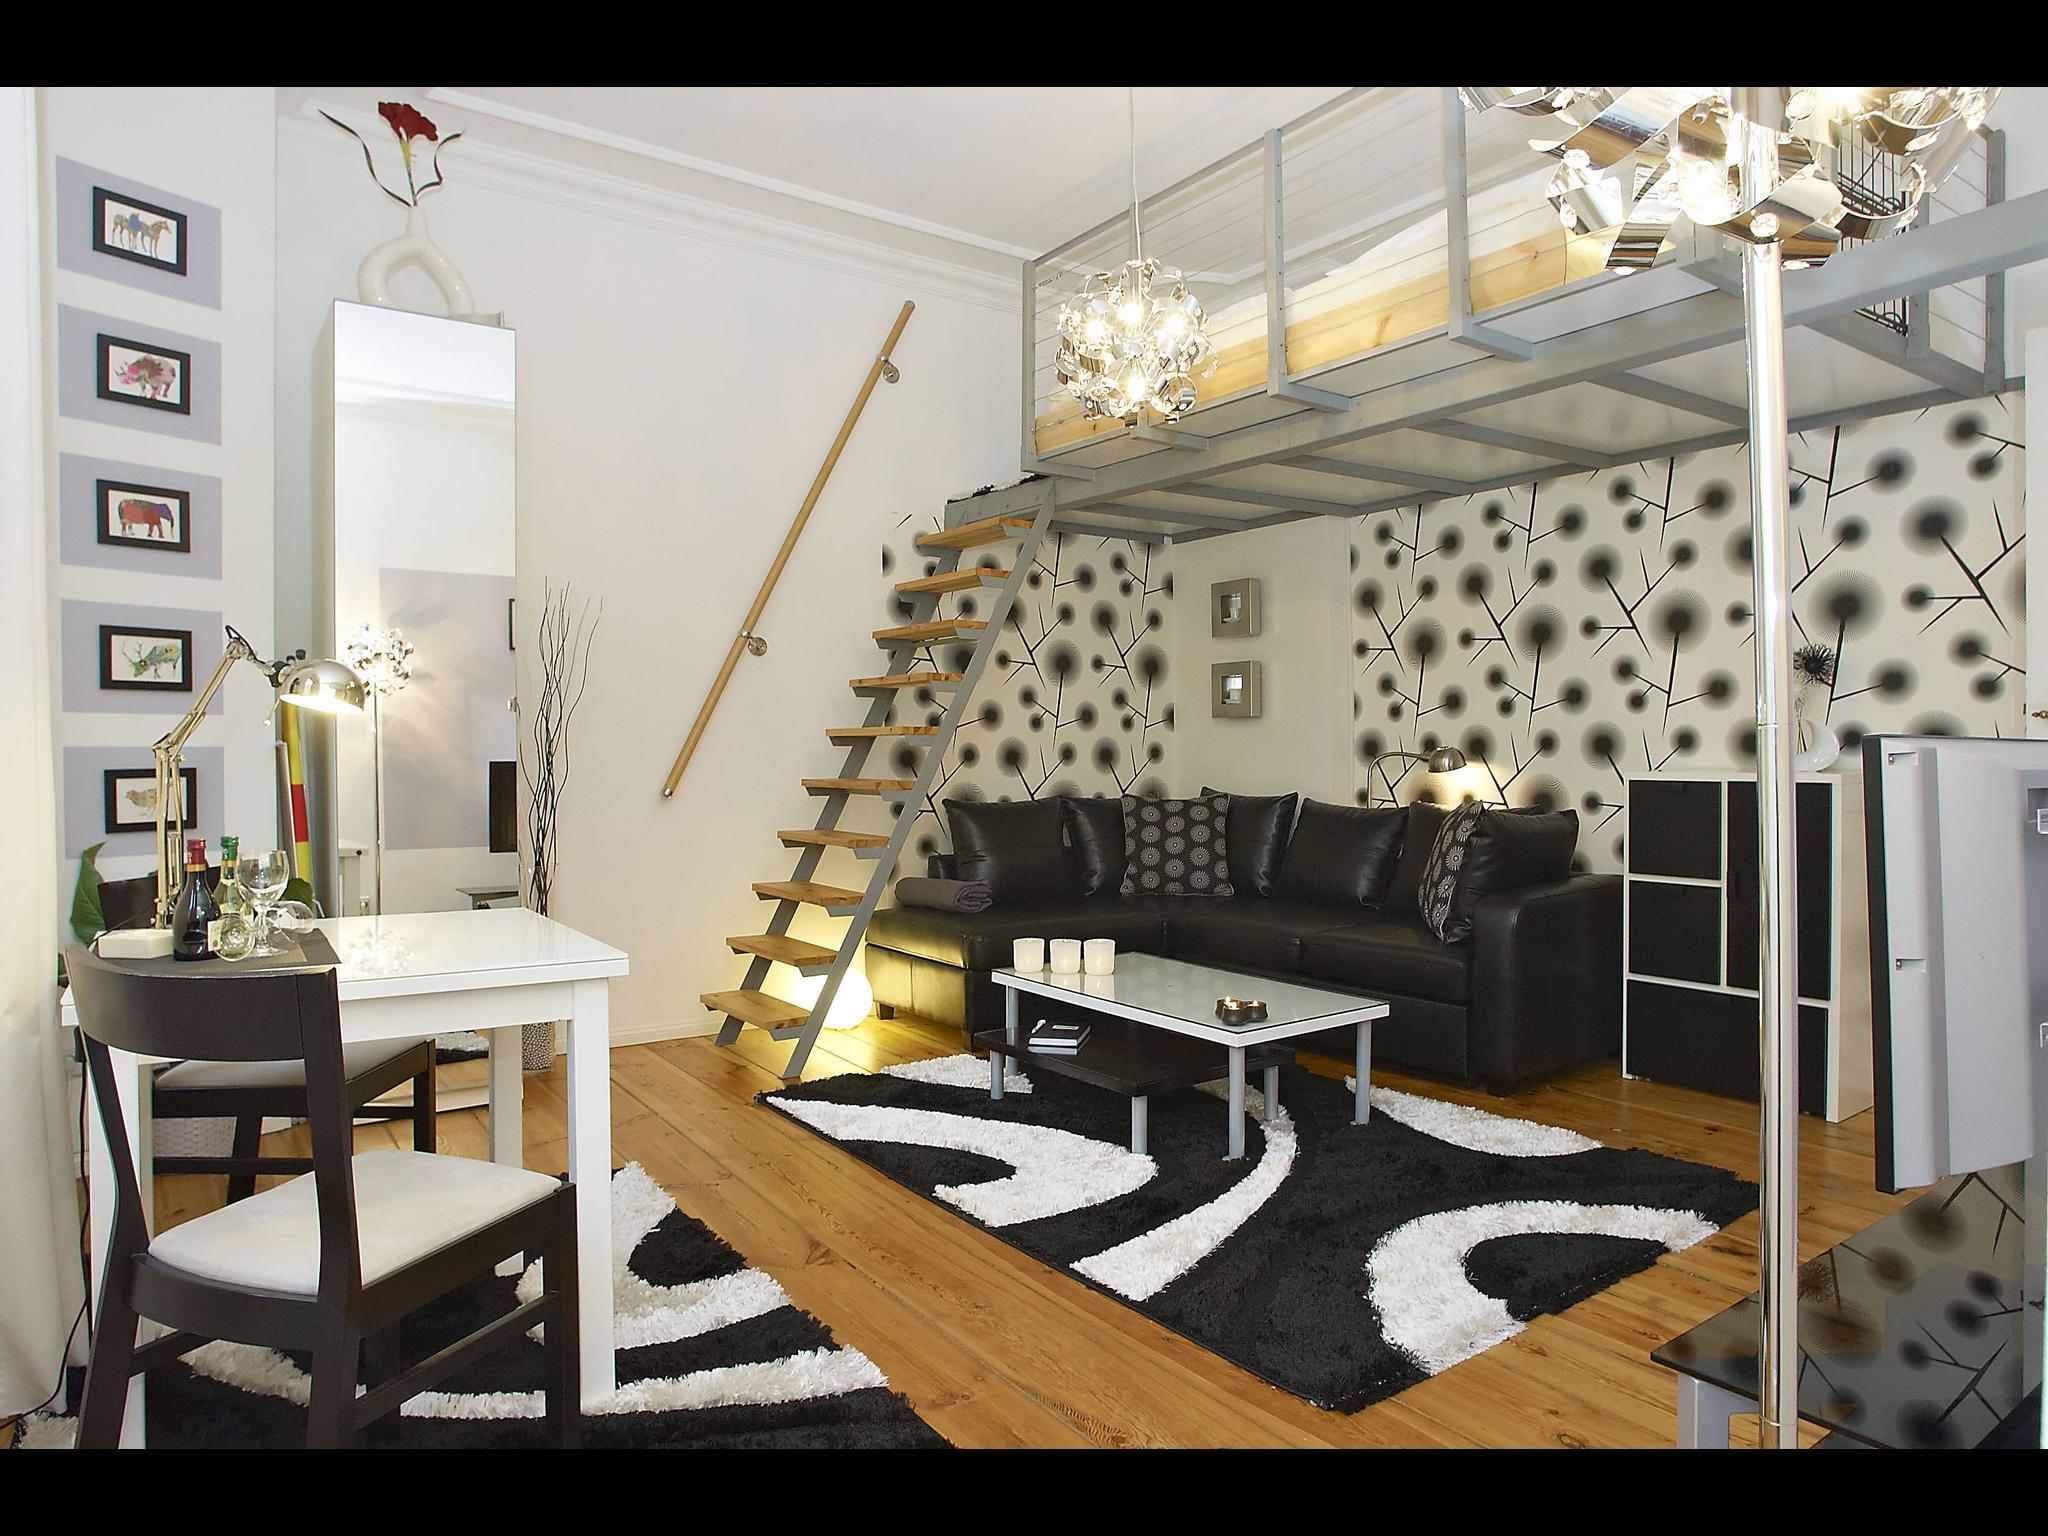 Urban 2 - Lovely studio in Berlin